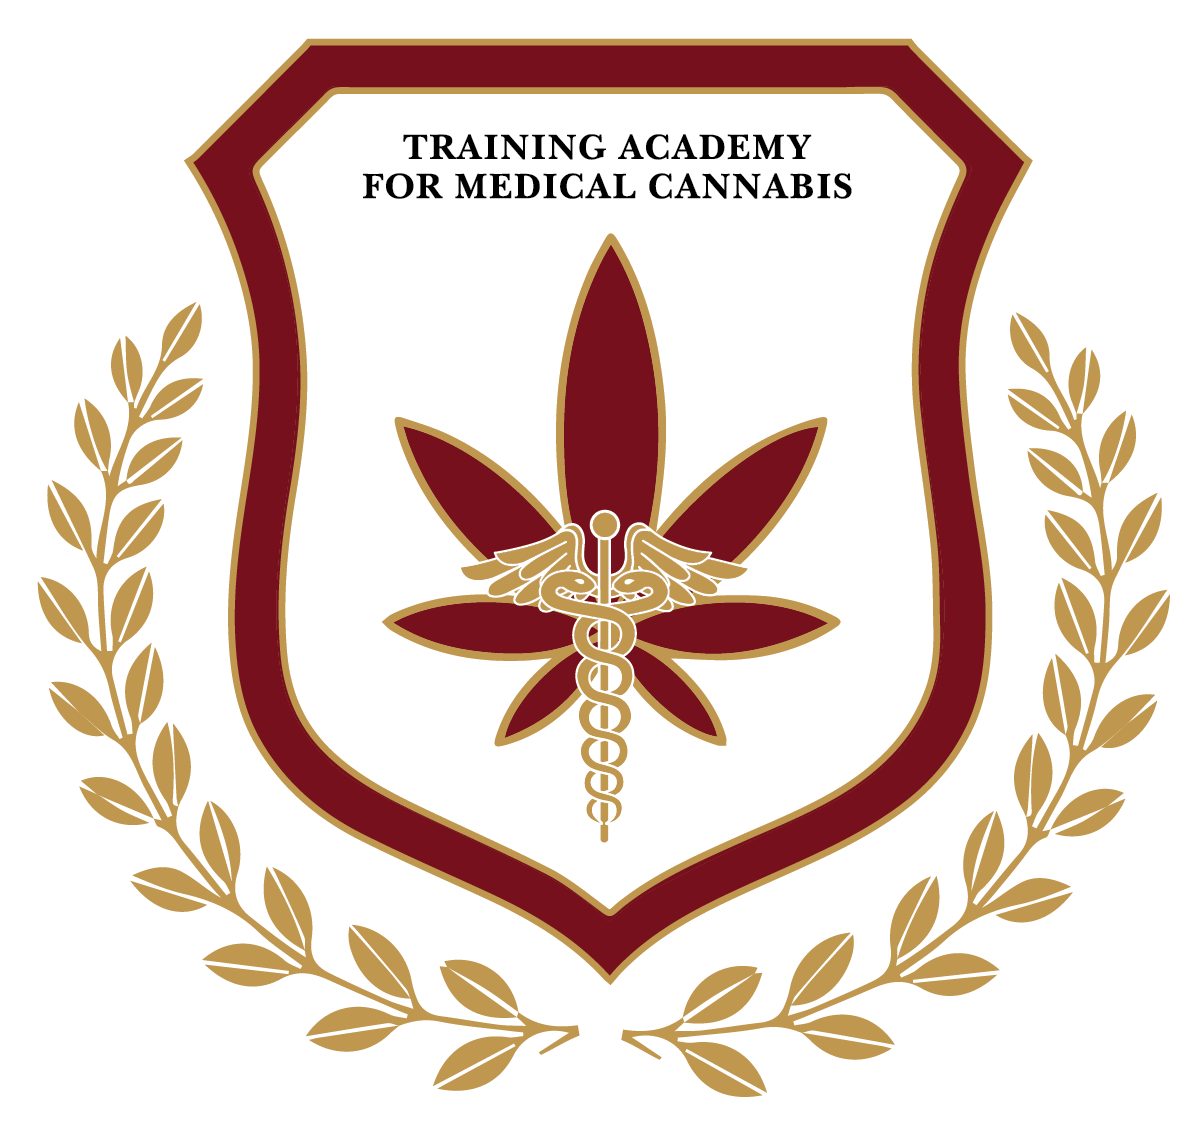 training academy for medical cannabis